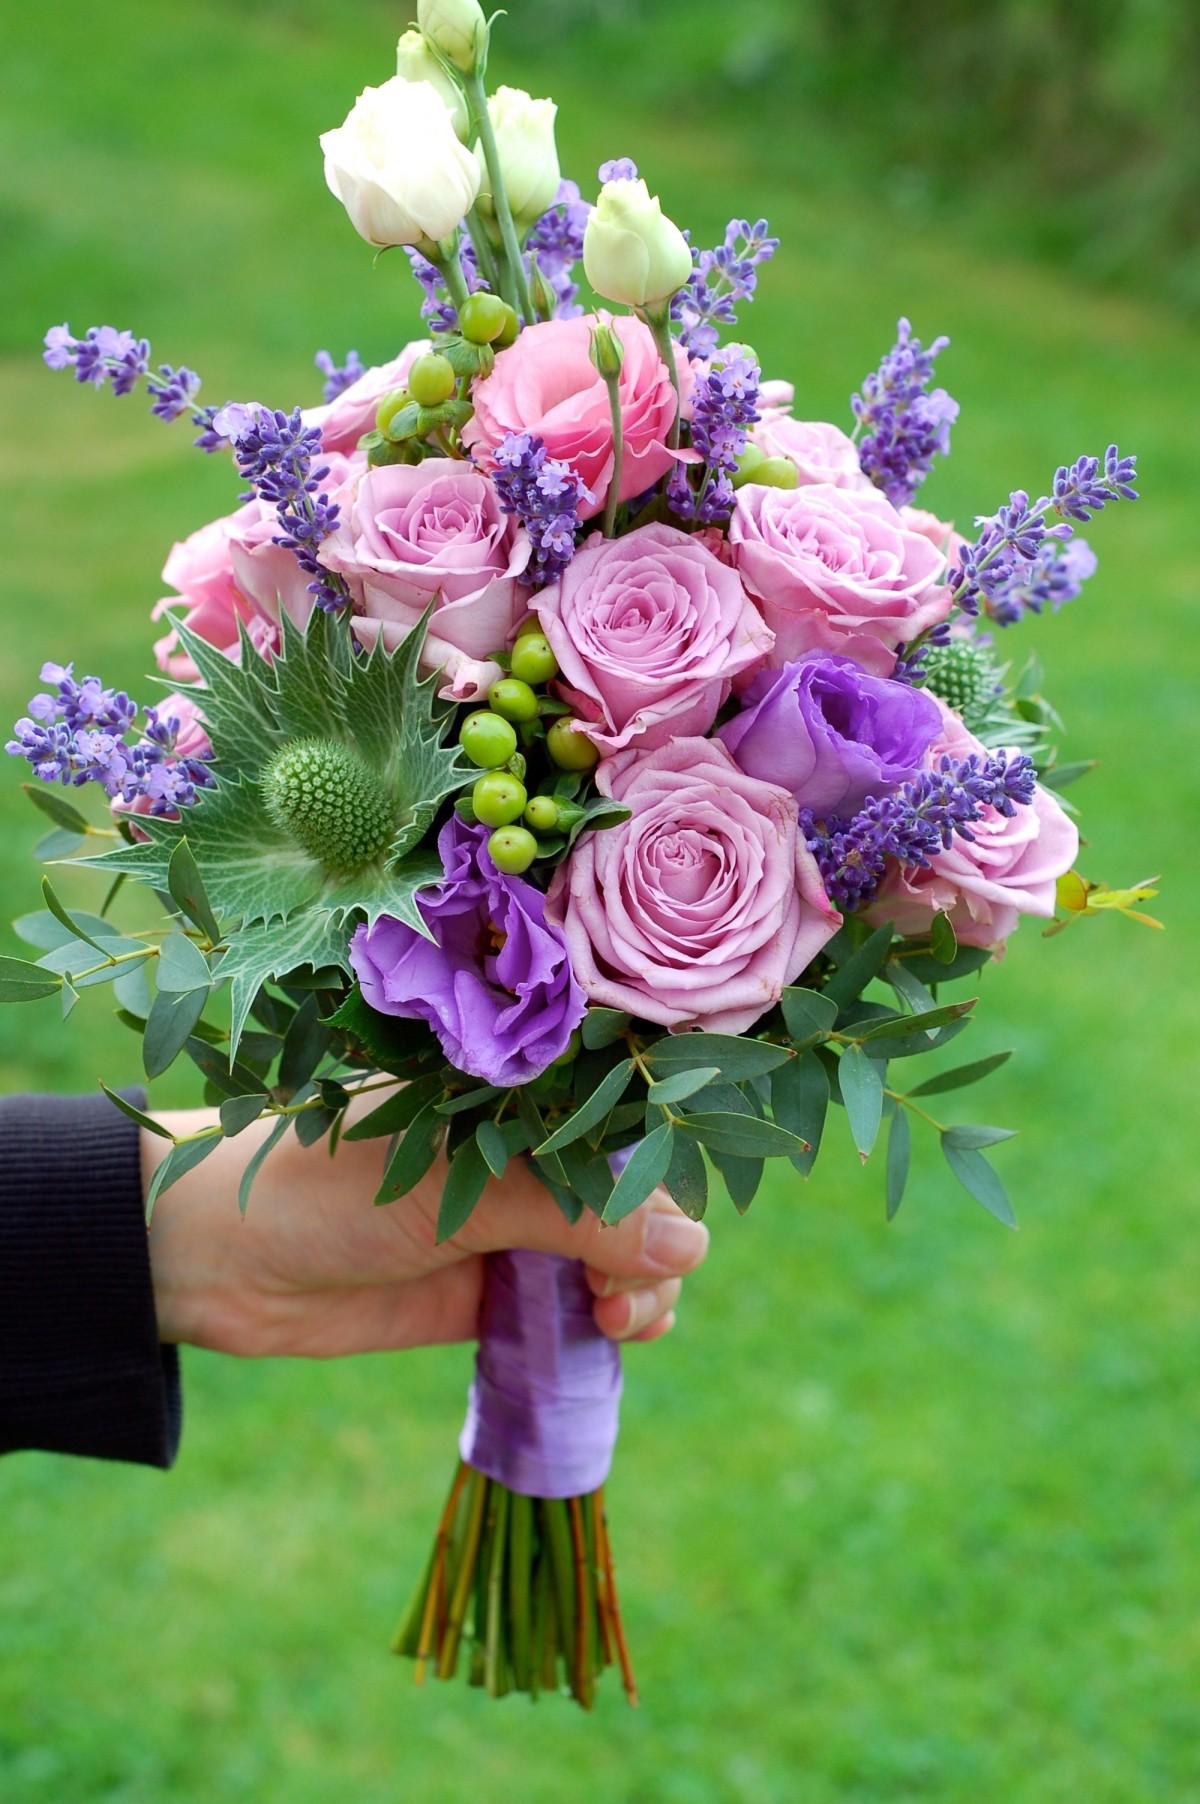 kostenlose foto bl hen wei blume lila rose gr n botanik flora floristik brautstrau. Black Bedroom Furniture Sets. Home Design Ideas